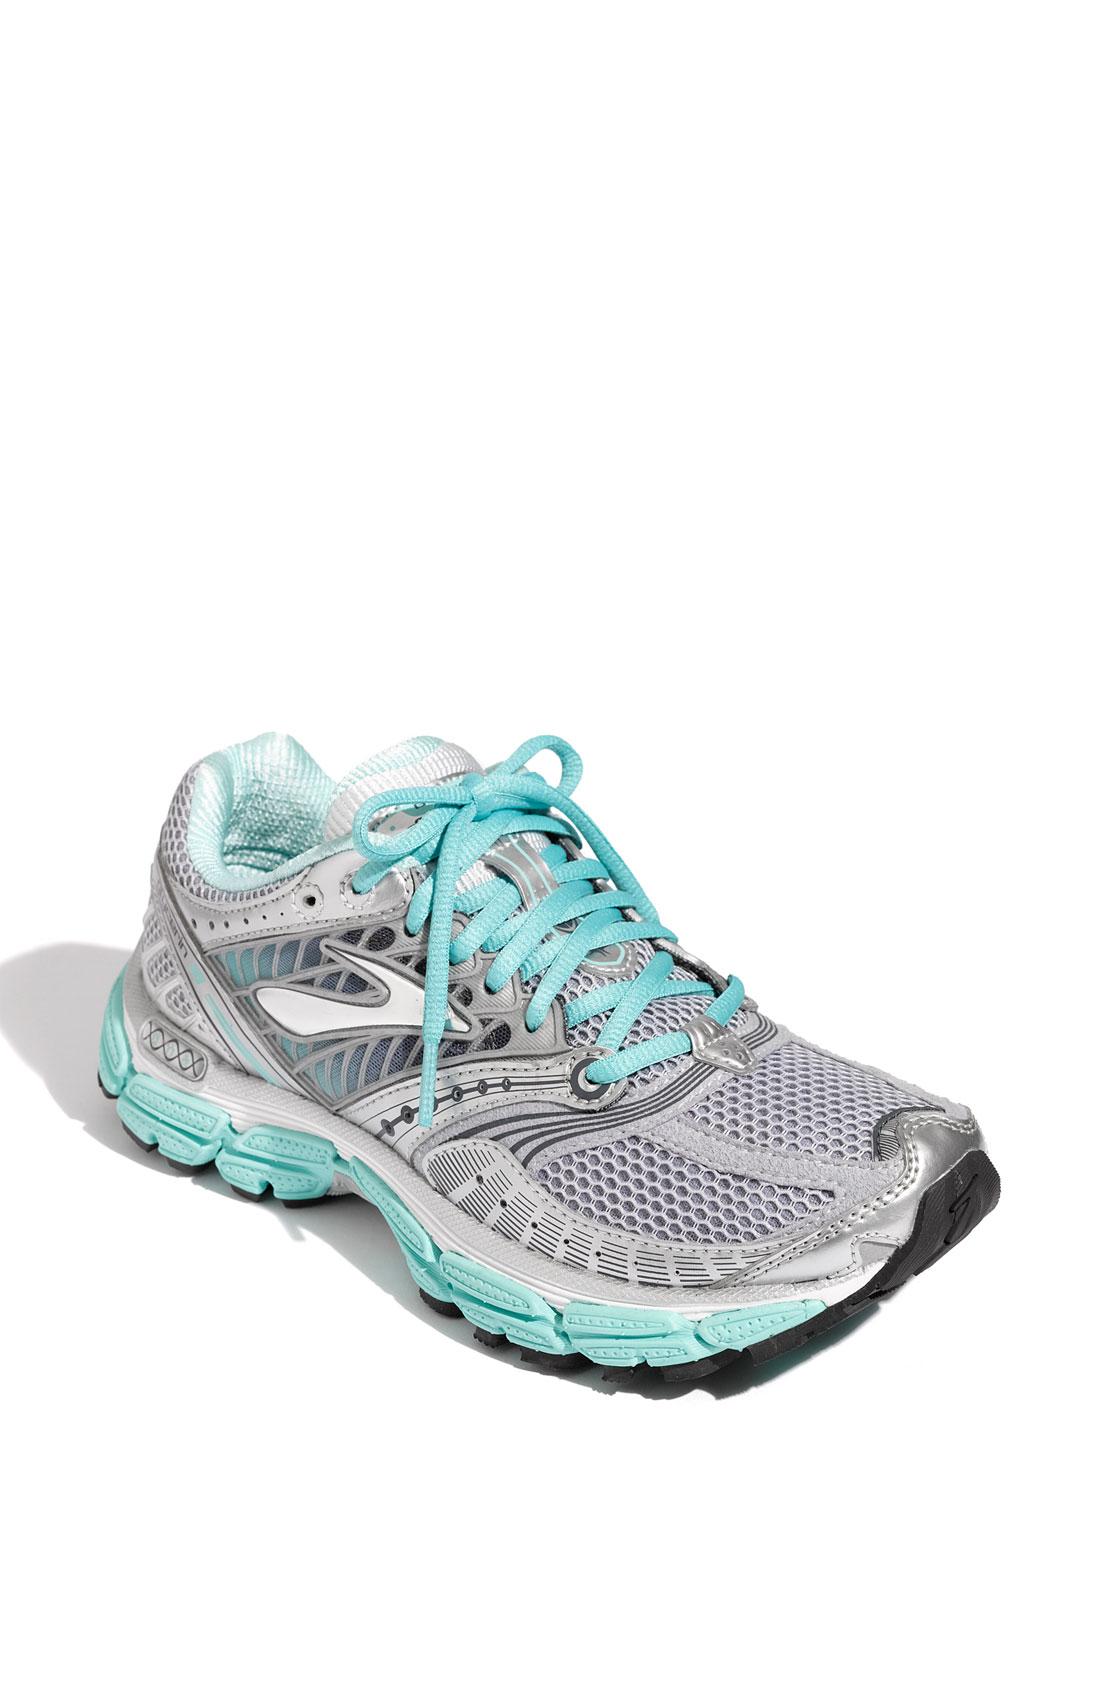 Brooks Glycerin  Womens Running Shoes